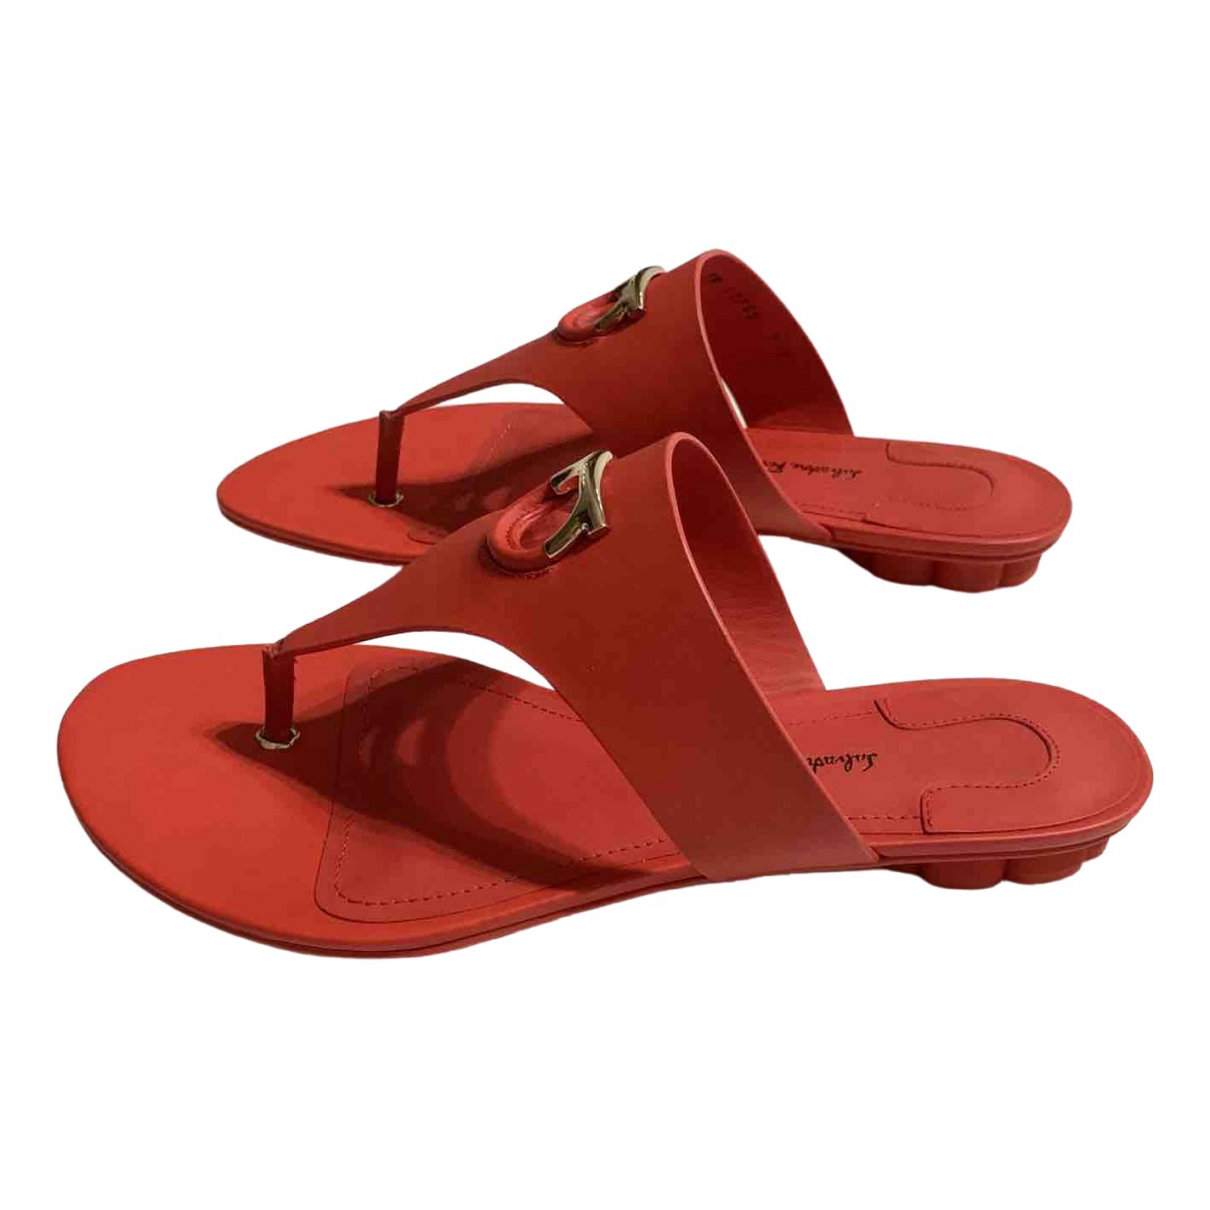 Salvatore Ferragamo \N Red Leather Sandals for Women 37.5 EU